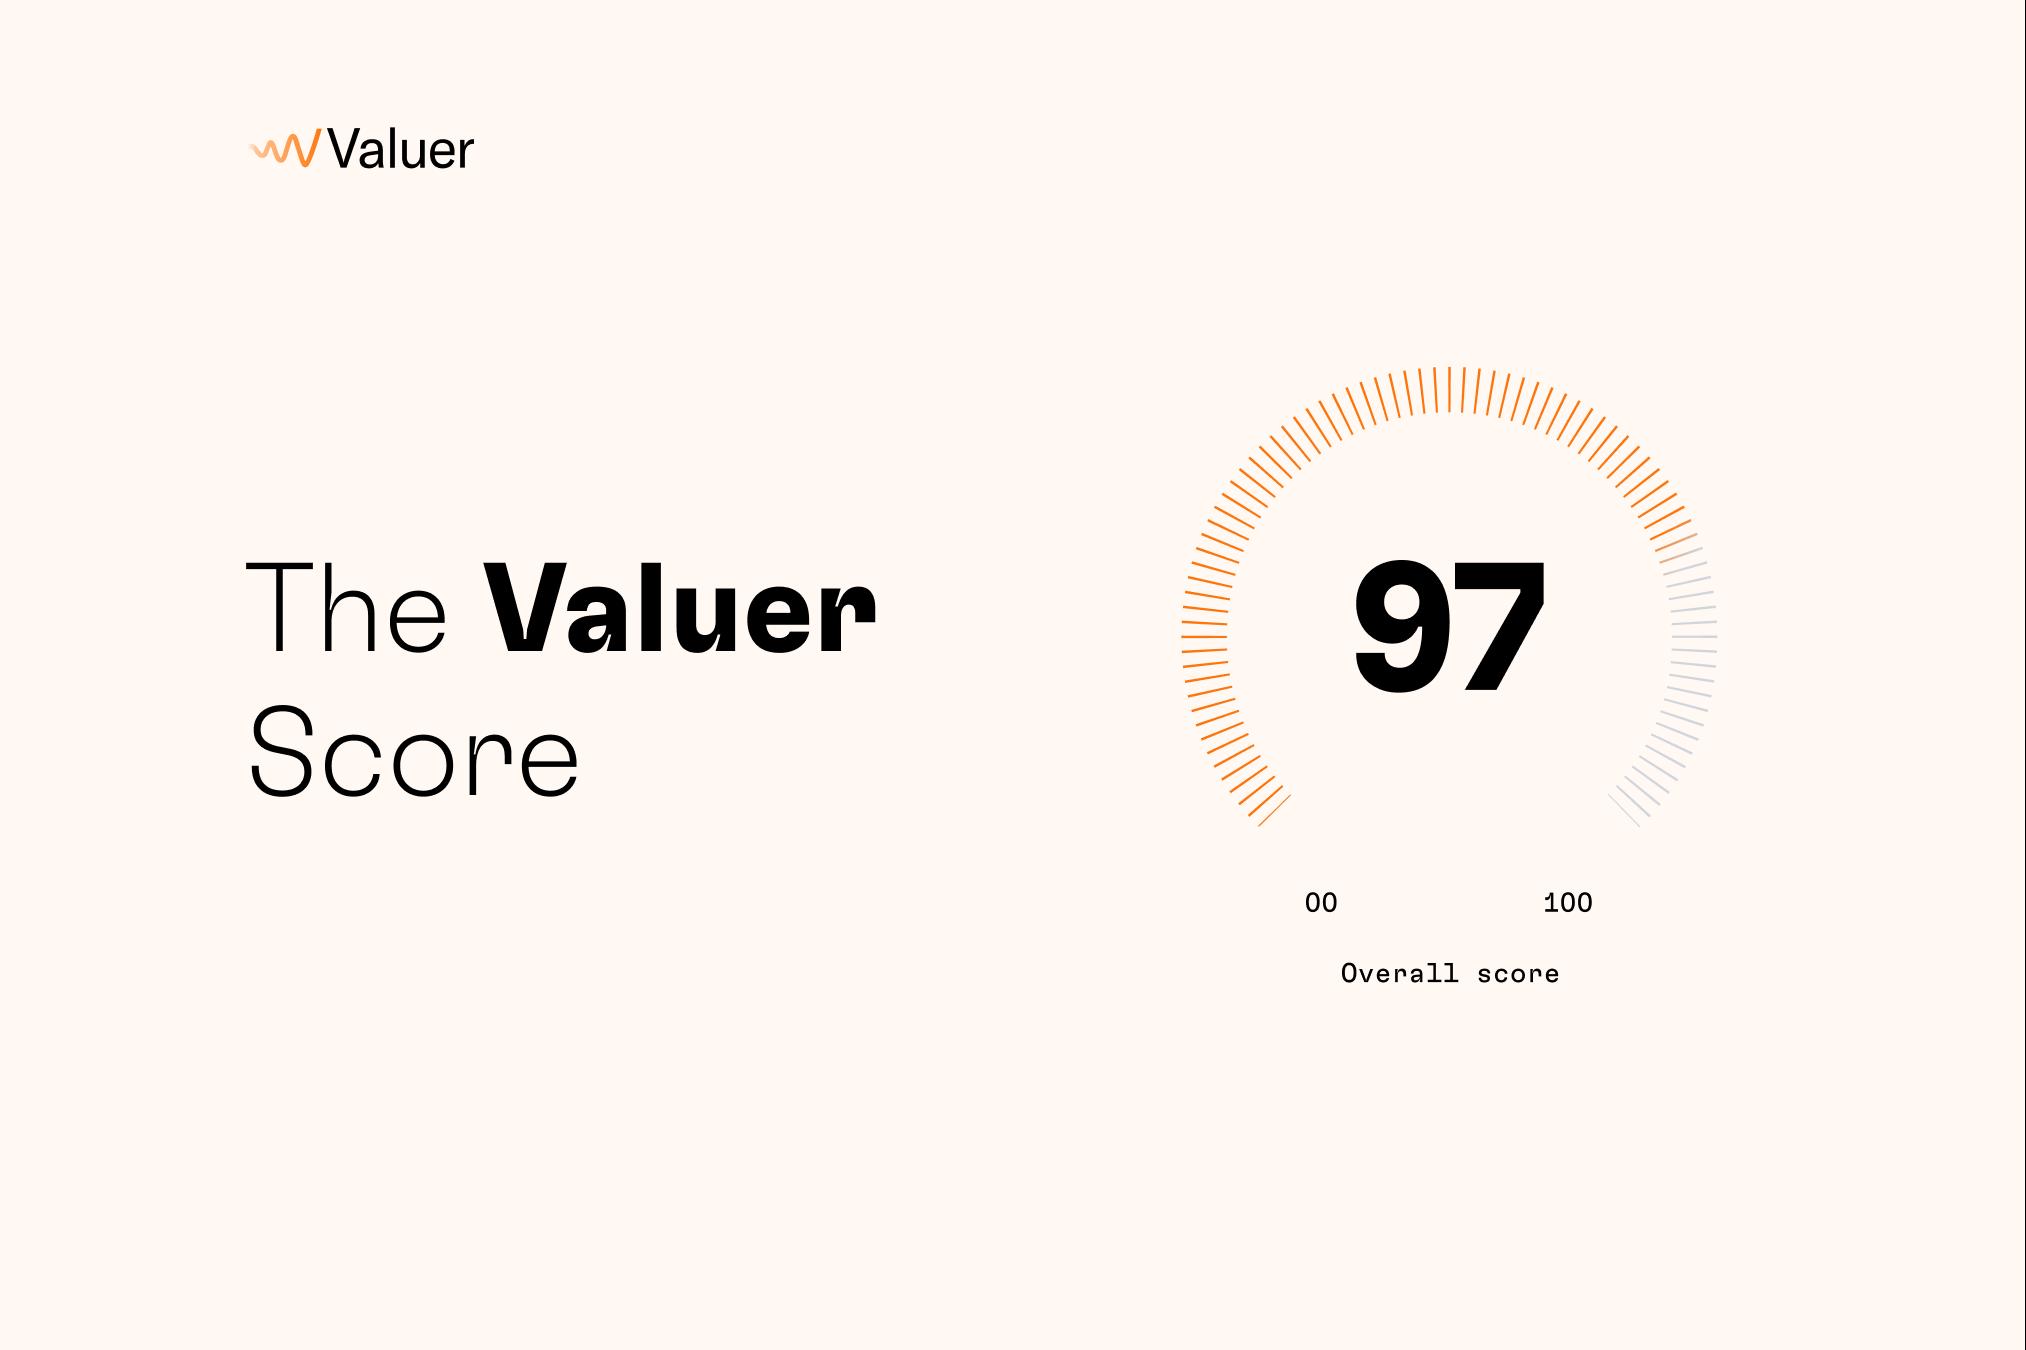 The Valuer score